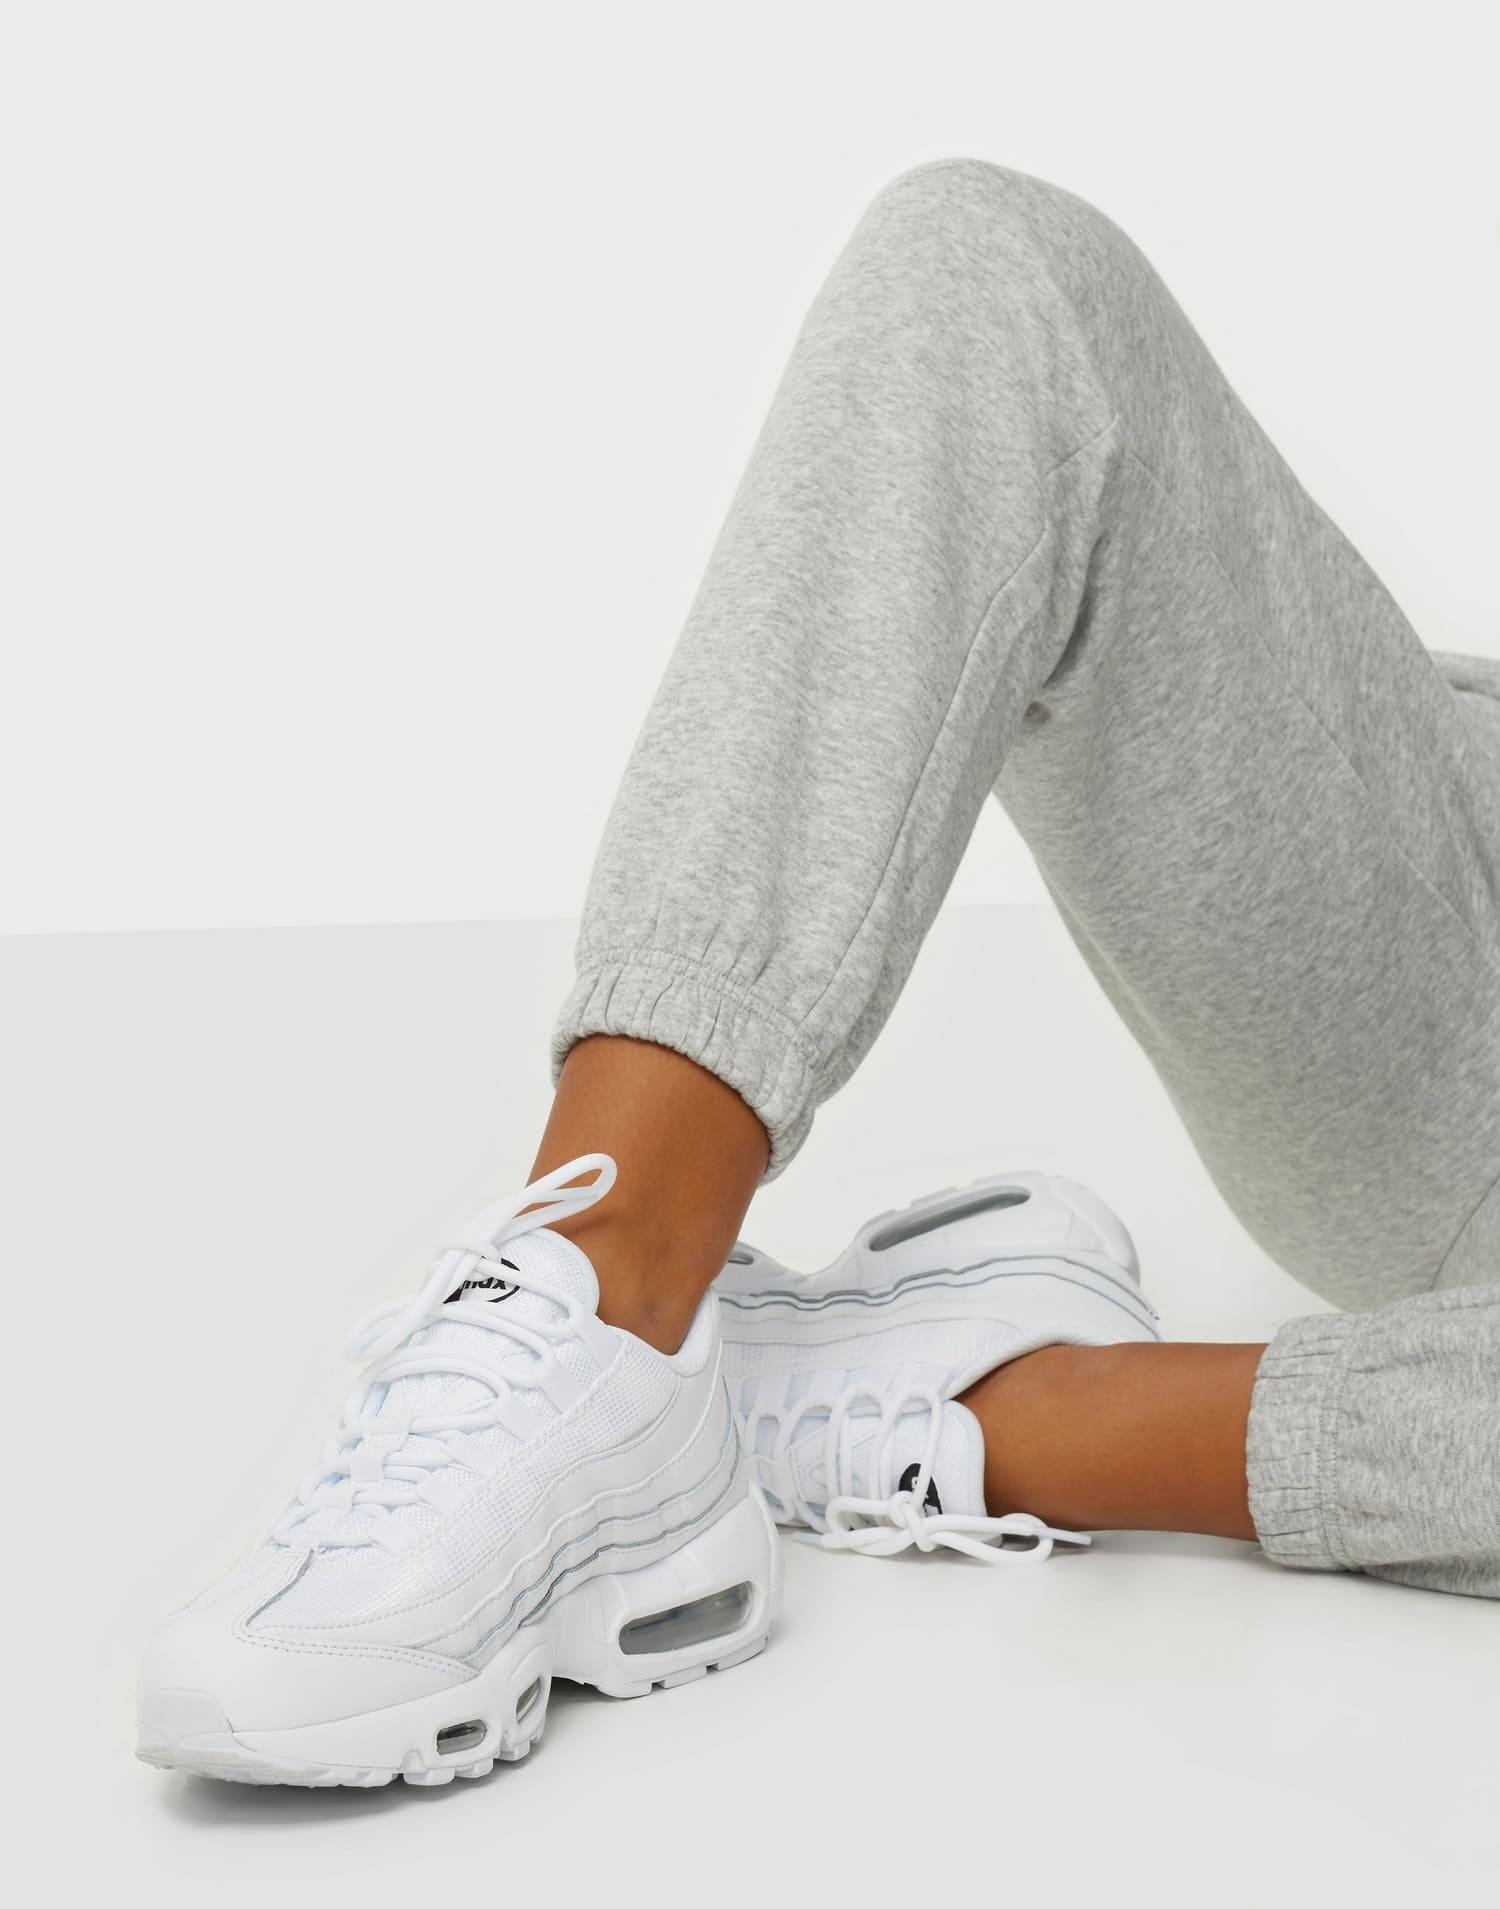 Vita sneakers från Nike i modellen Air Max 95.